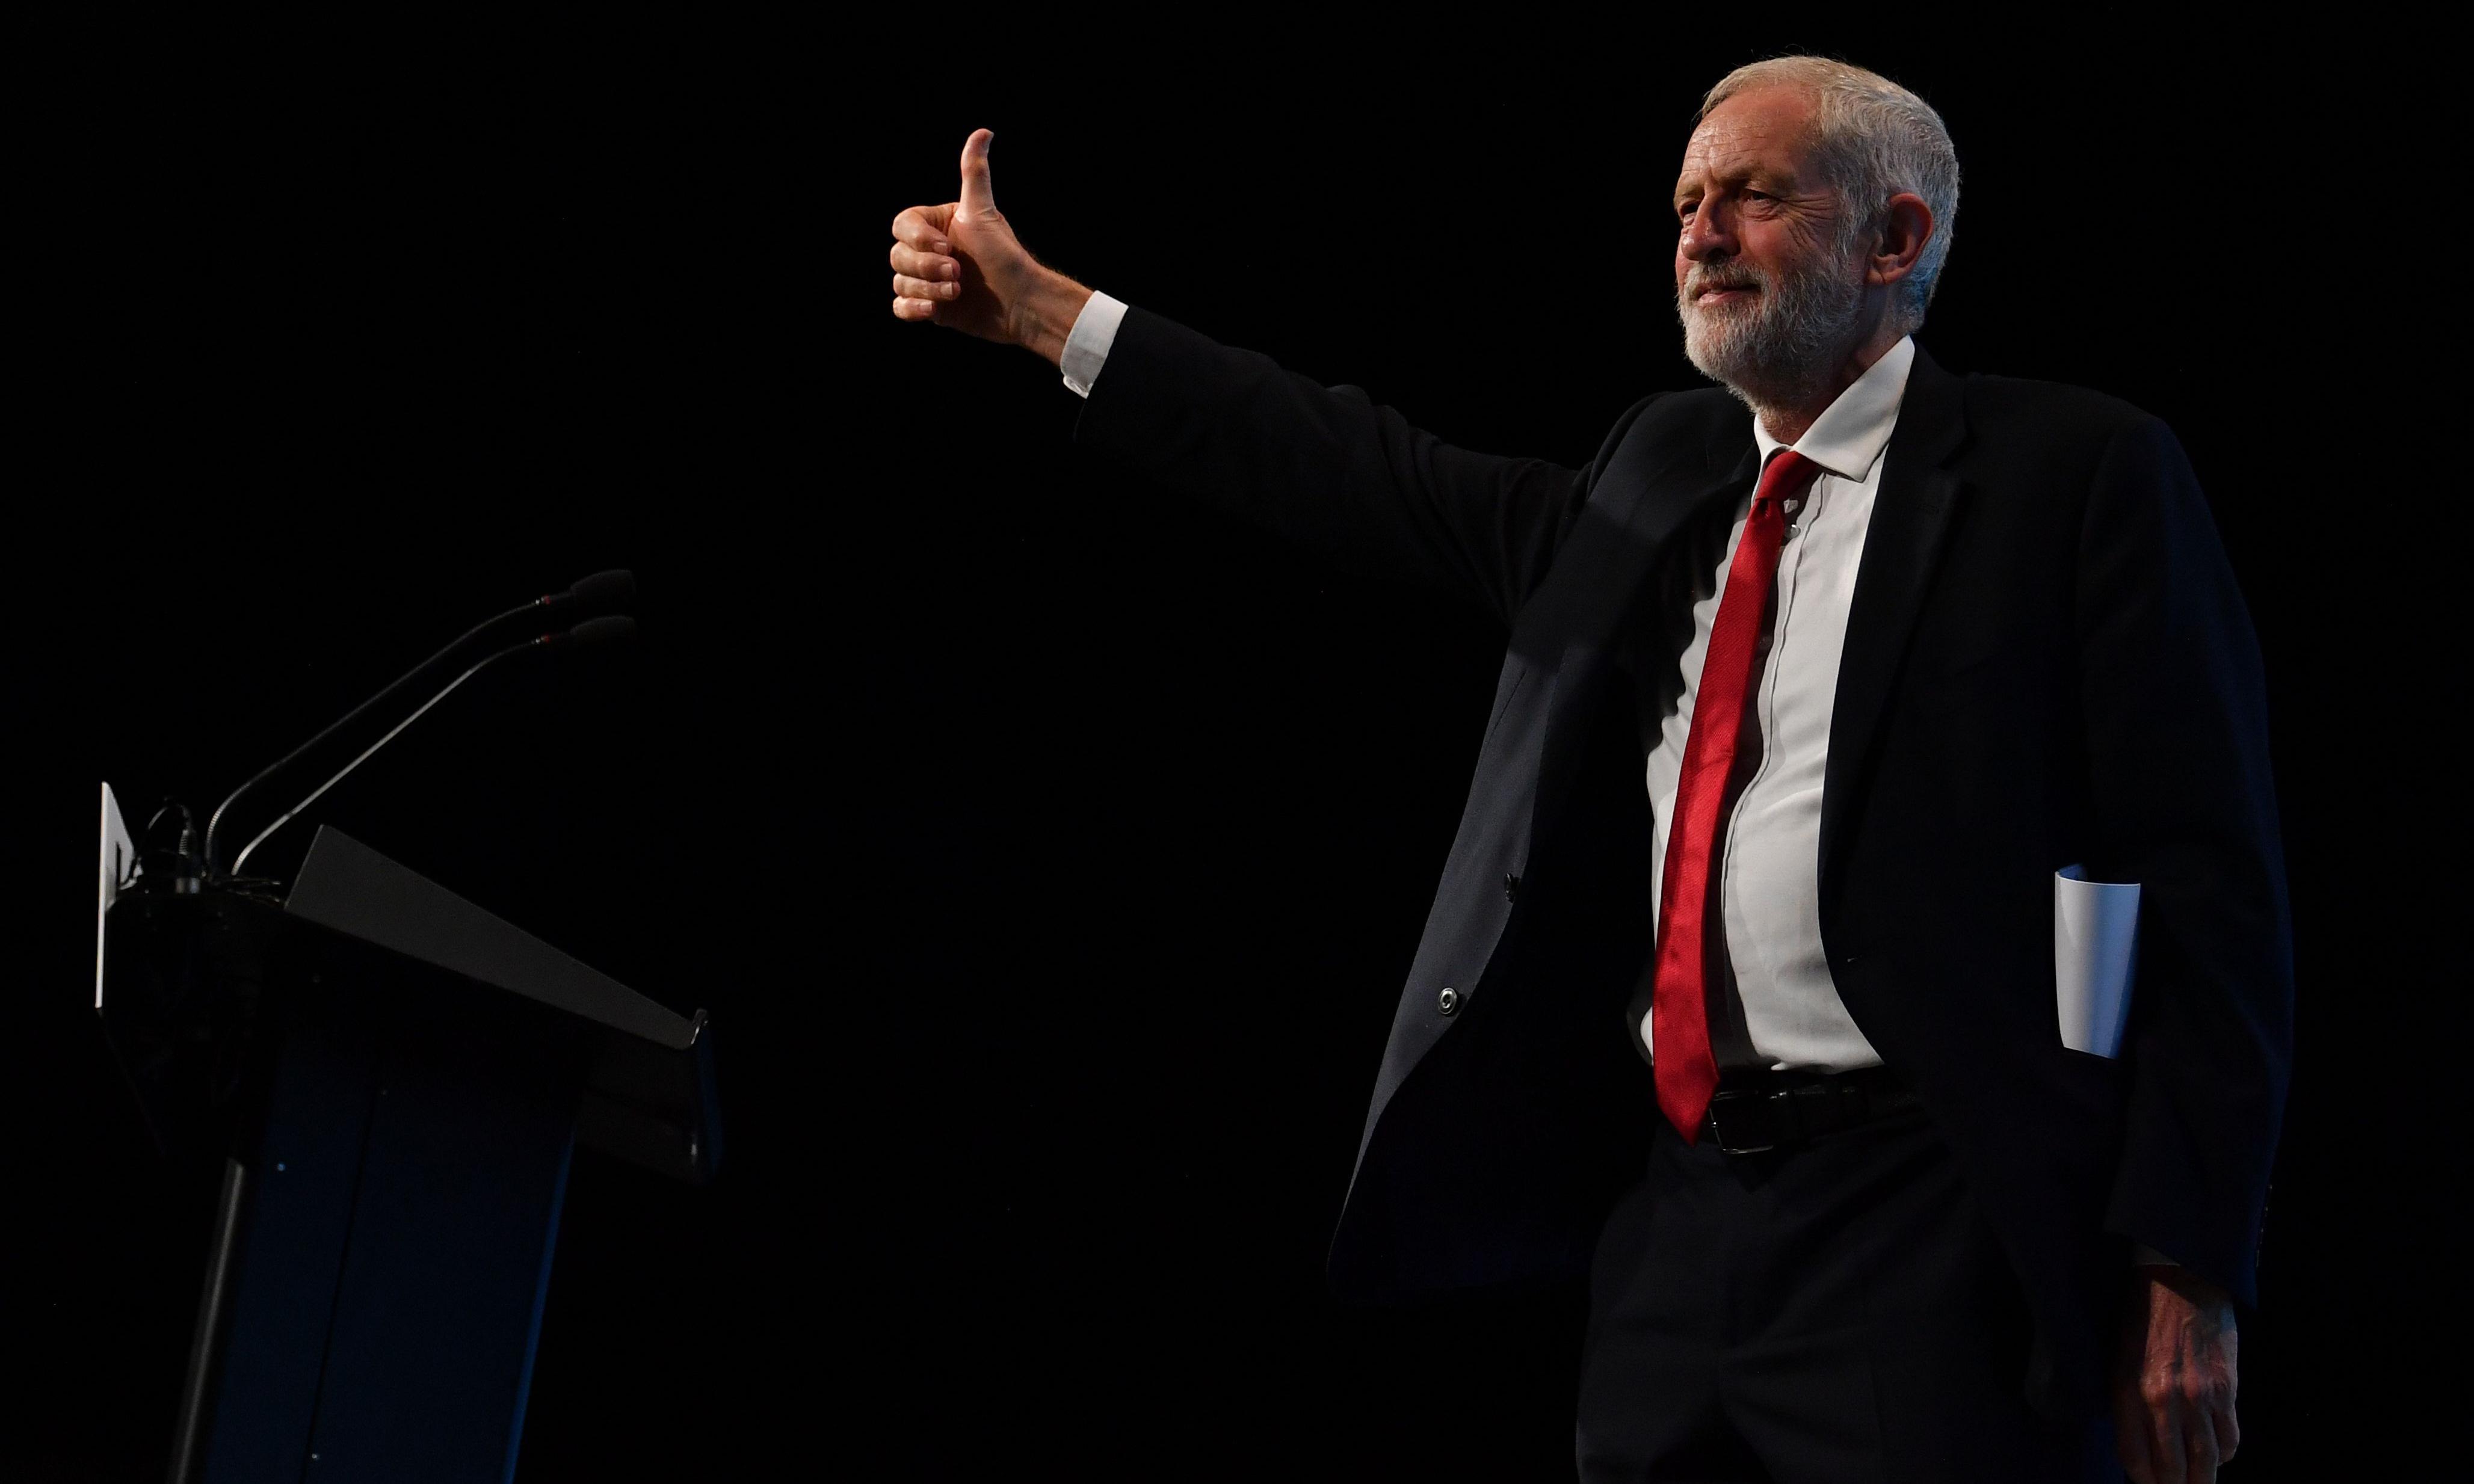 Never mind 'tax raids', Labour – just abolish private education